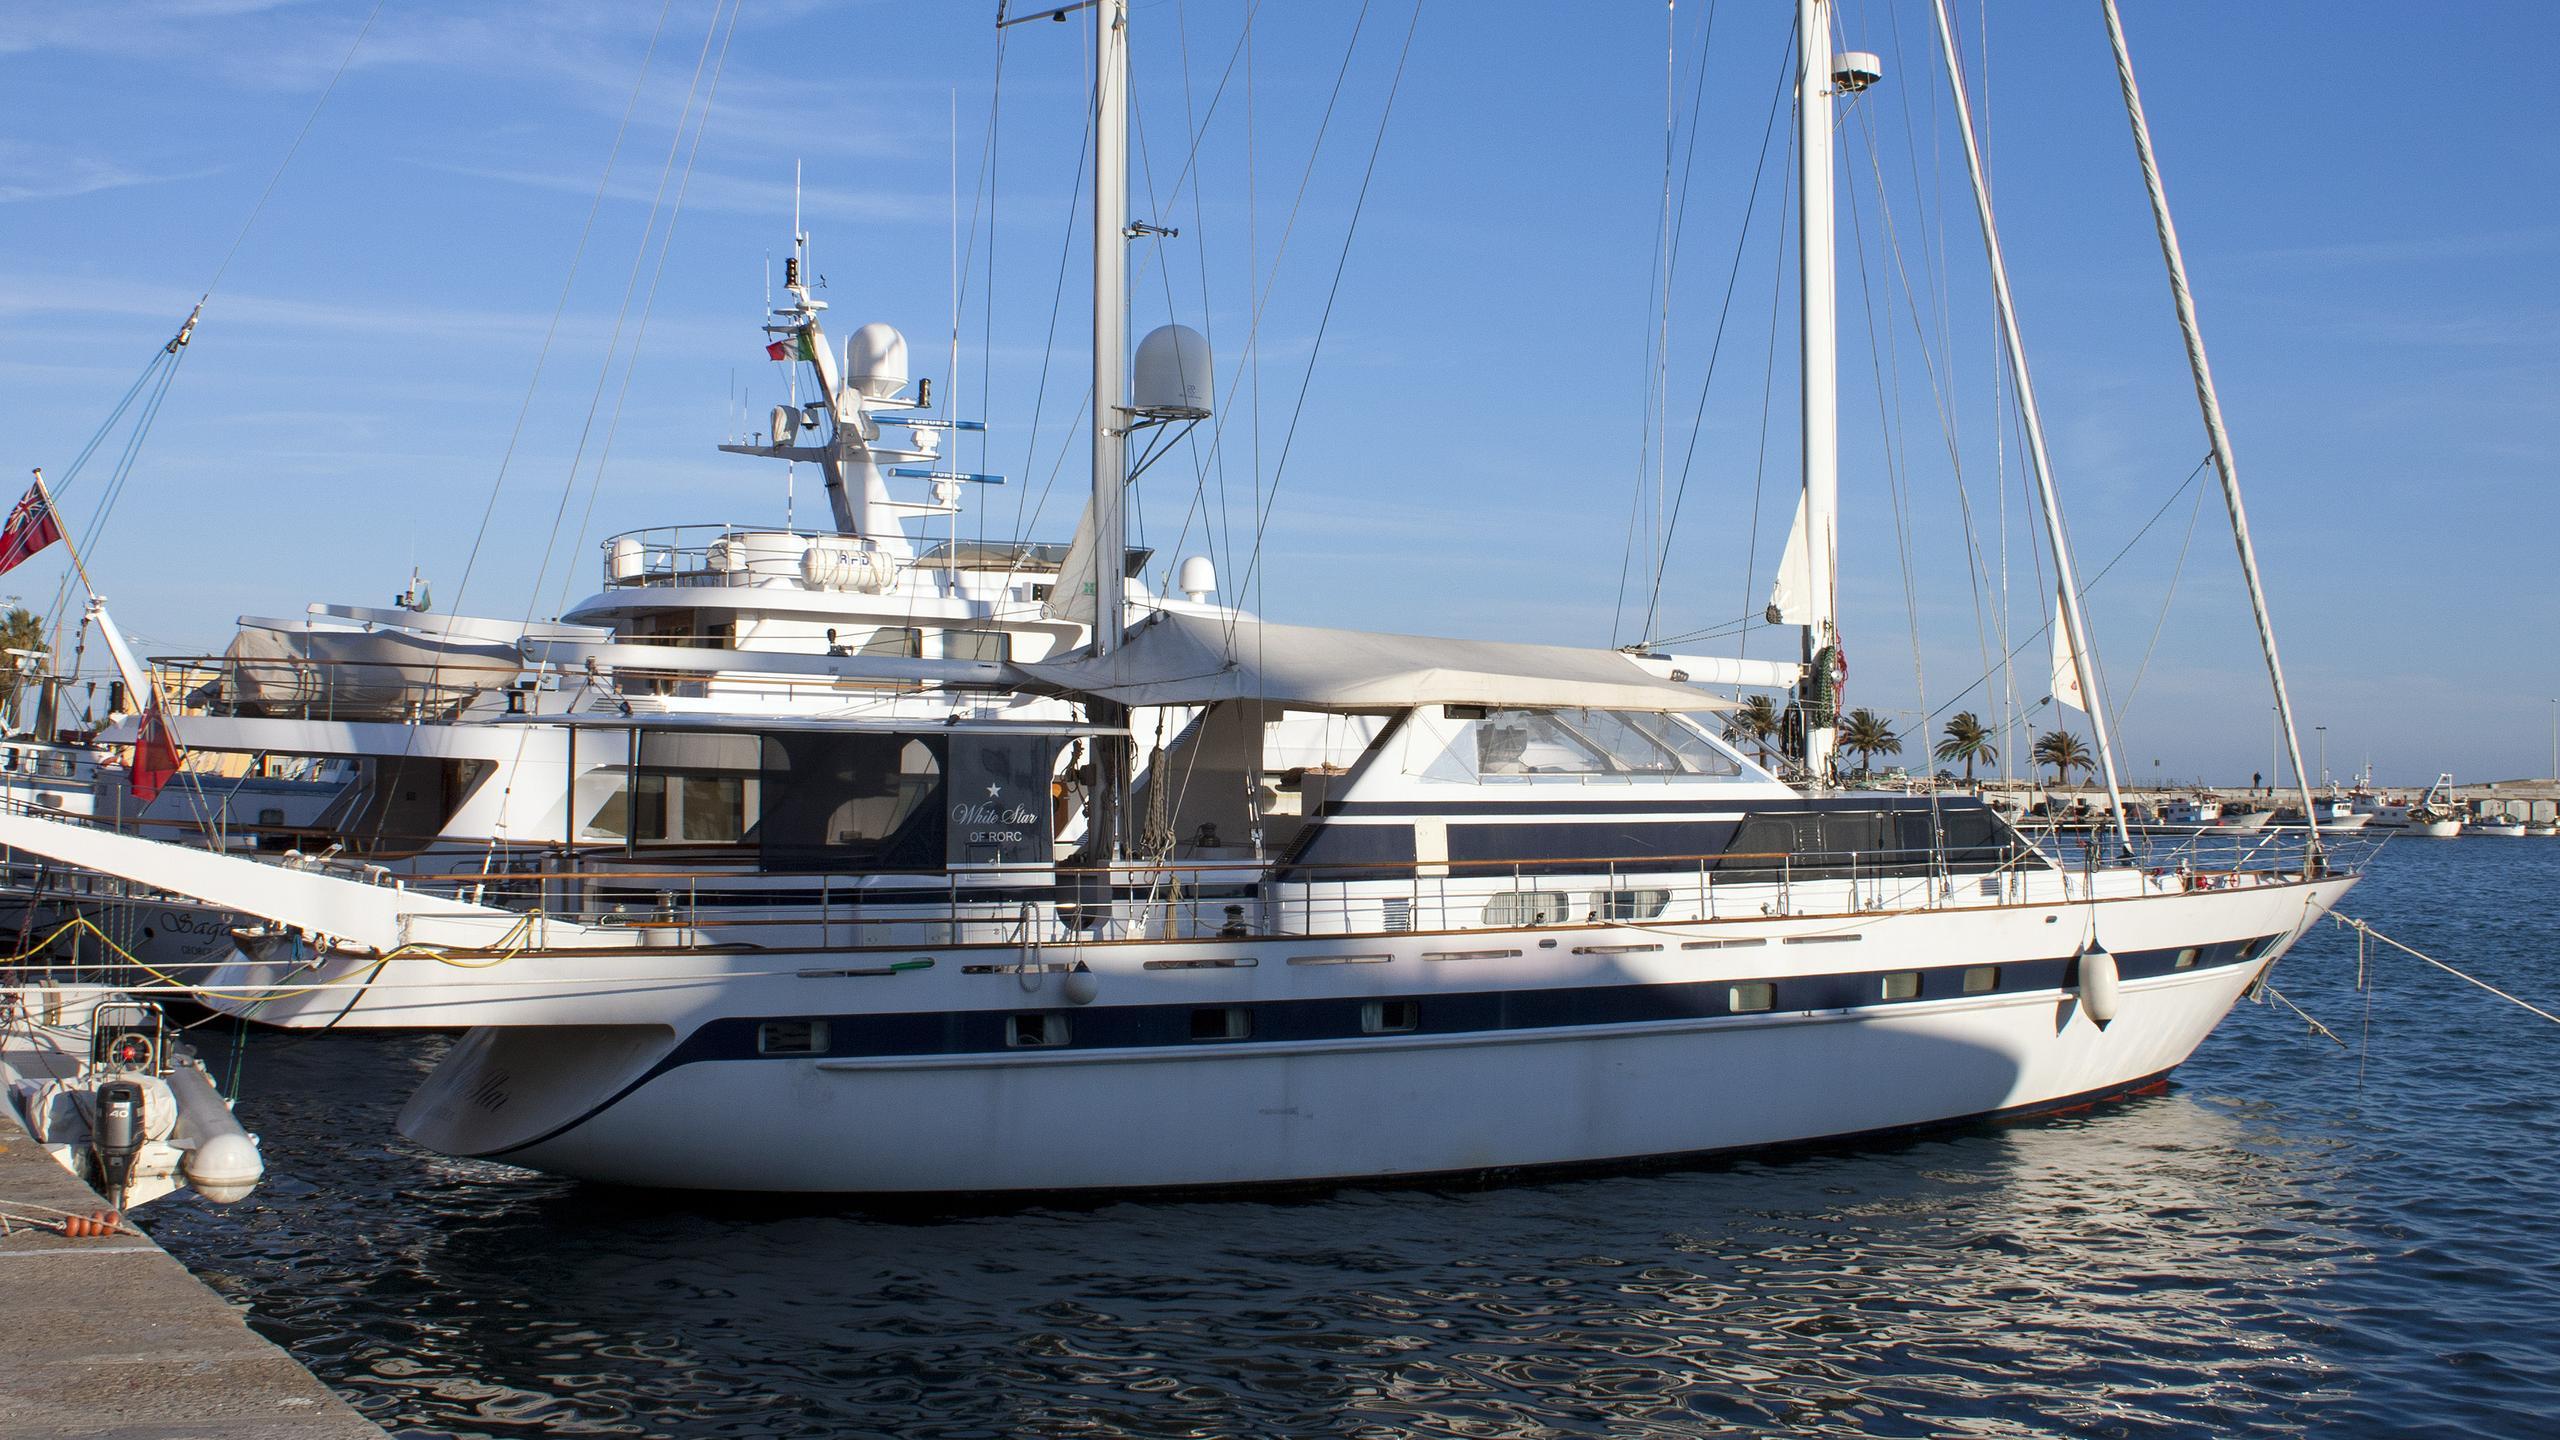 white-star-of-rorc-sailing-yacht-porsius-albaran-26-1986-26m-profile